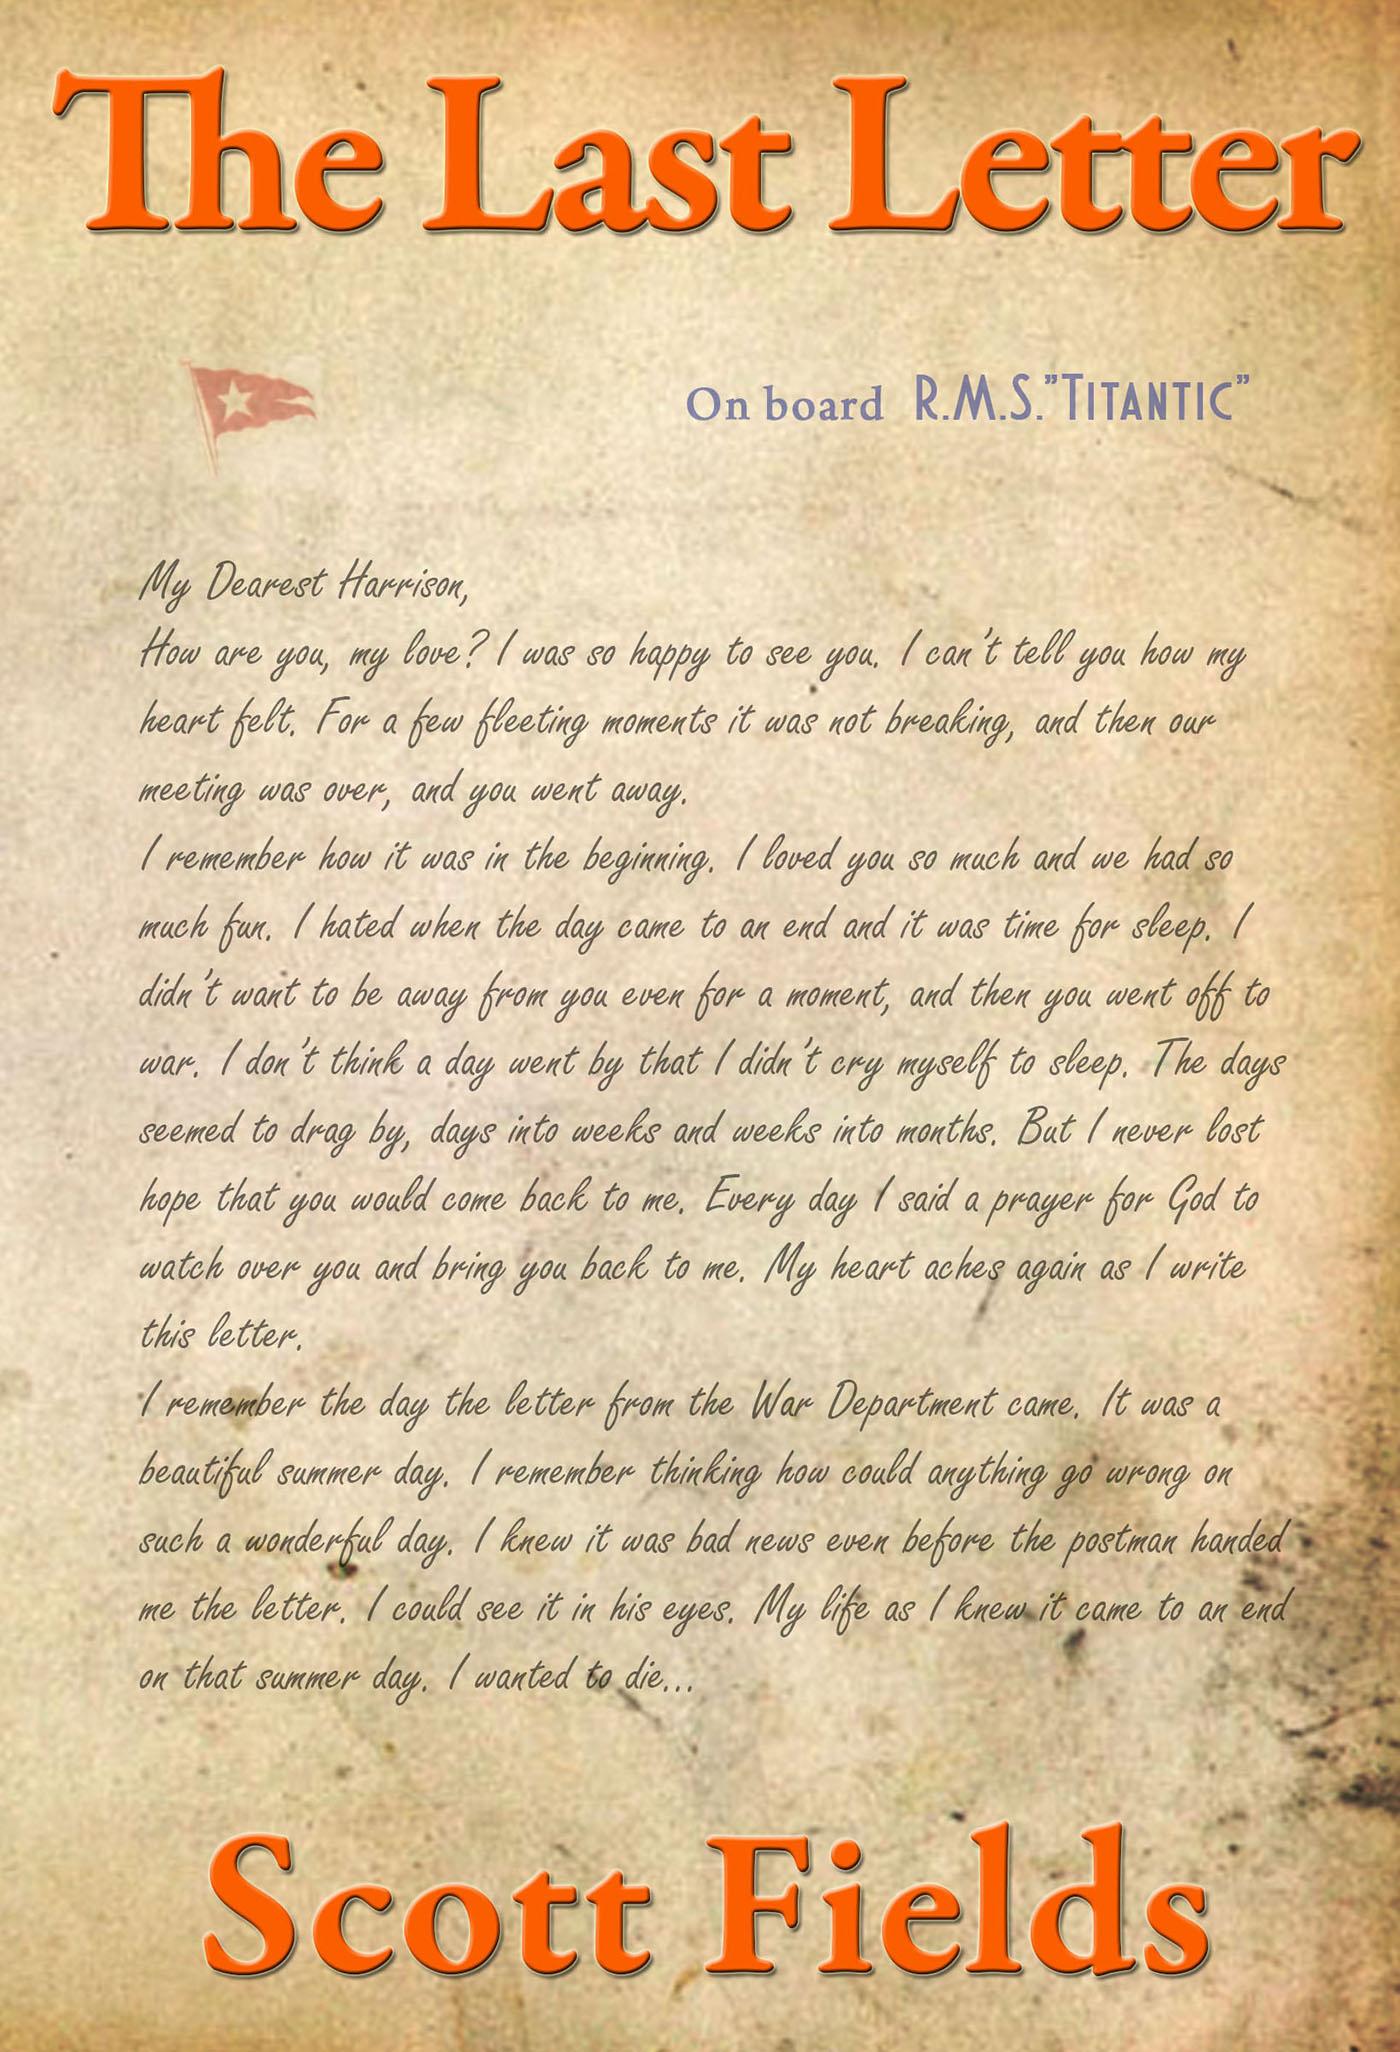 The Last Letter, Scott Fields, Outer Banks Publishing Group